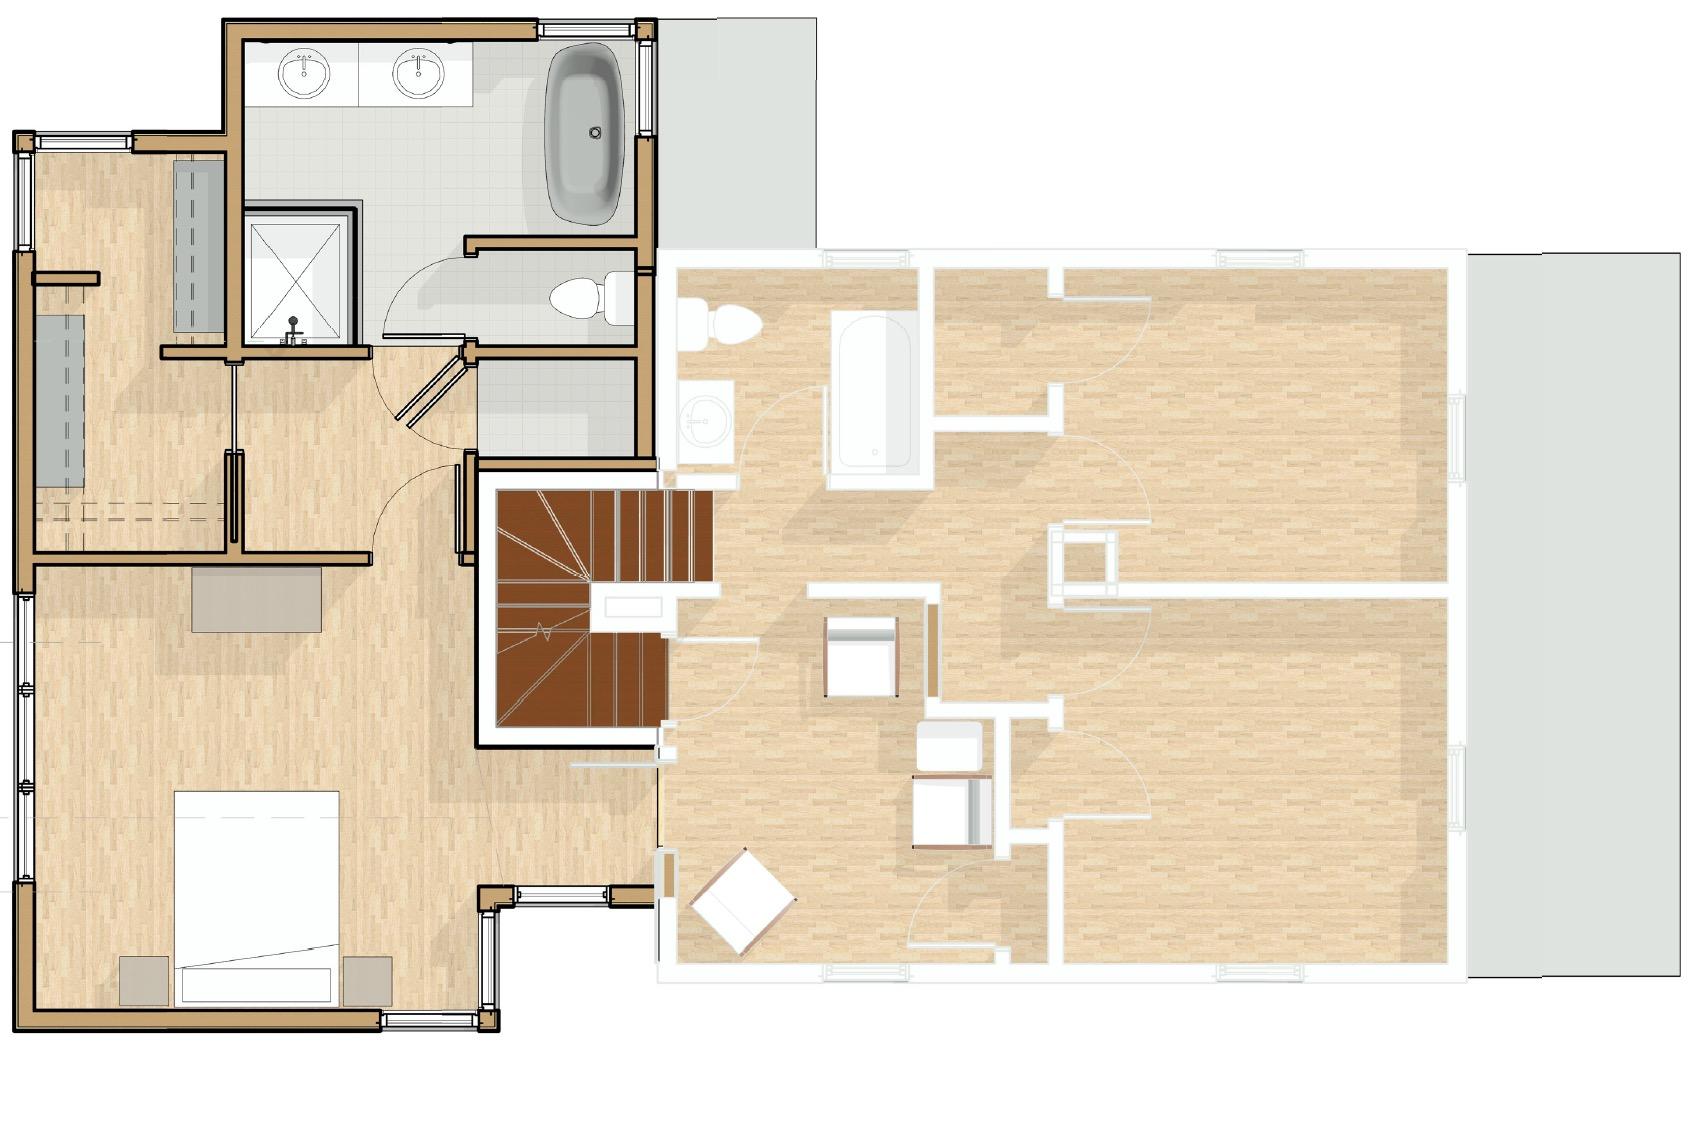 second-floor-plan.JPG